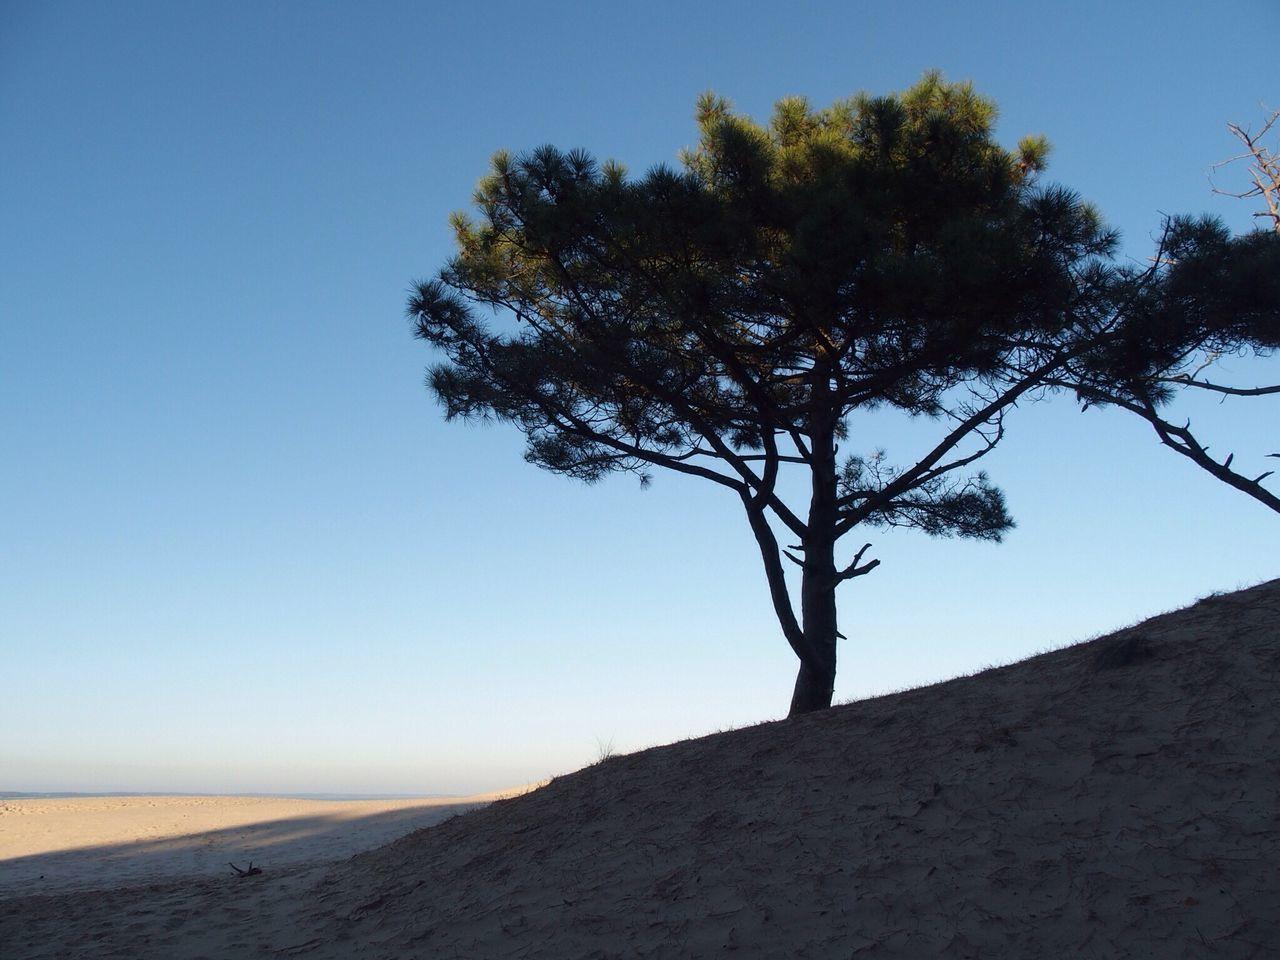 Tree Nature Tranquil Scene Outdoors Clear Sky Beauty In Nature No People Sky Naturelovers Sand Beach Dune Du Pyla Dunes Dunescape Dunedupilat Dune Du Pilat Arcachon Dune